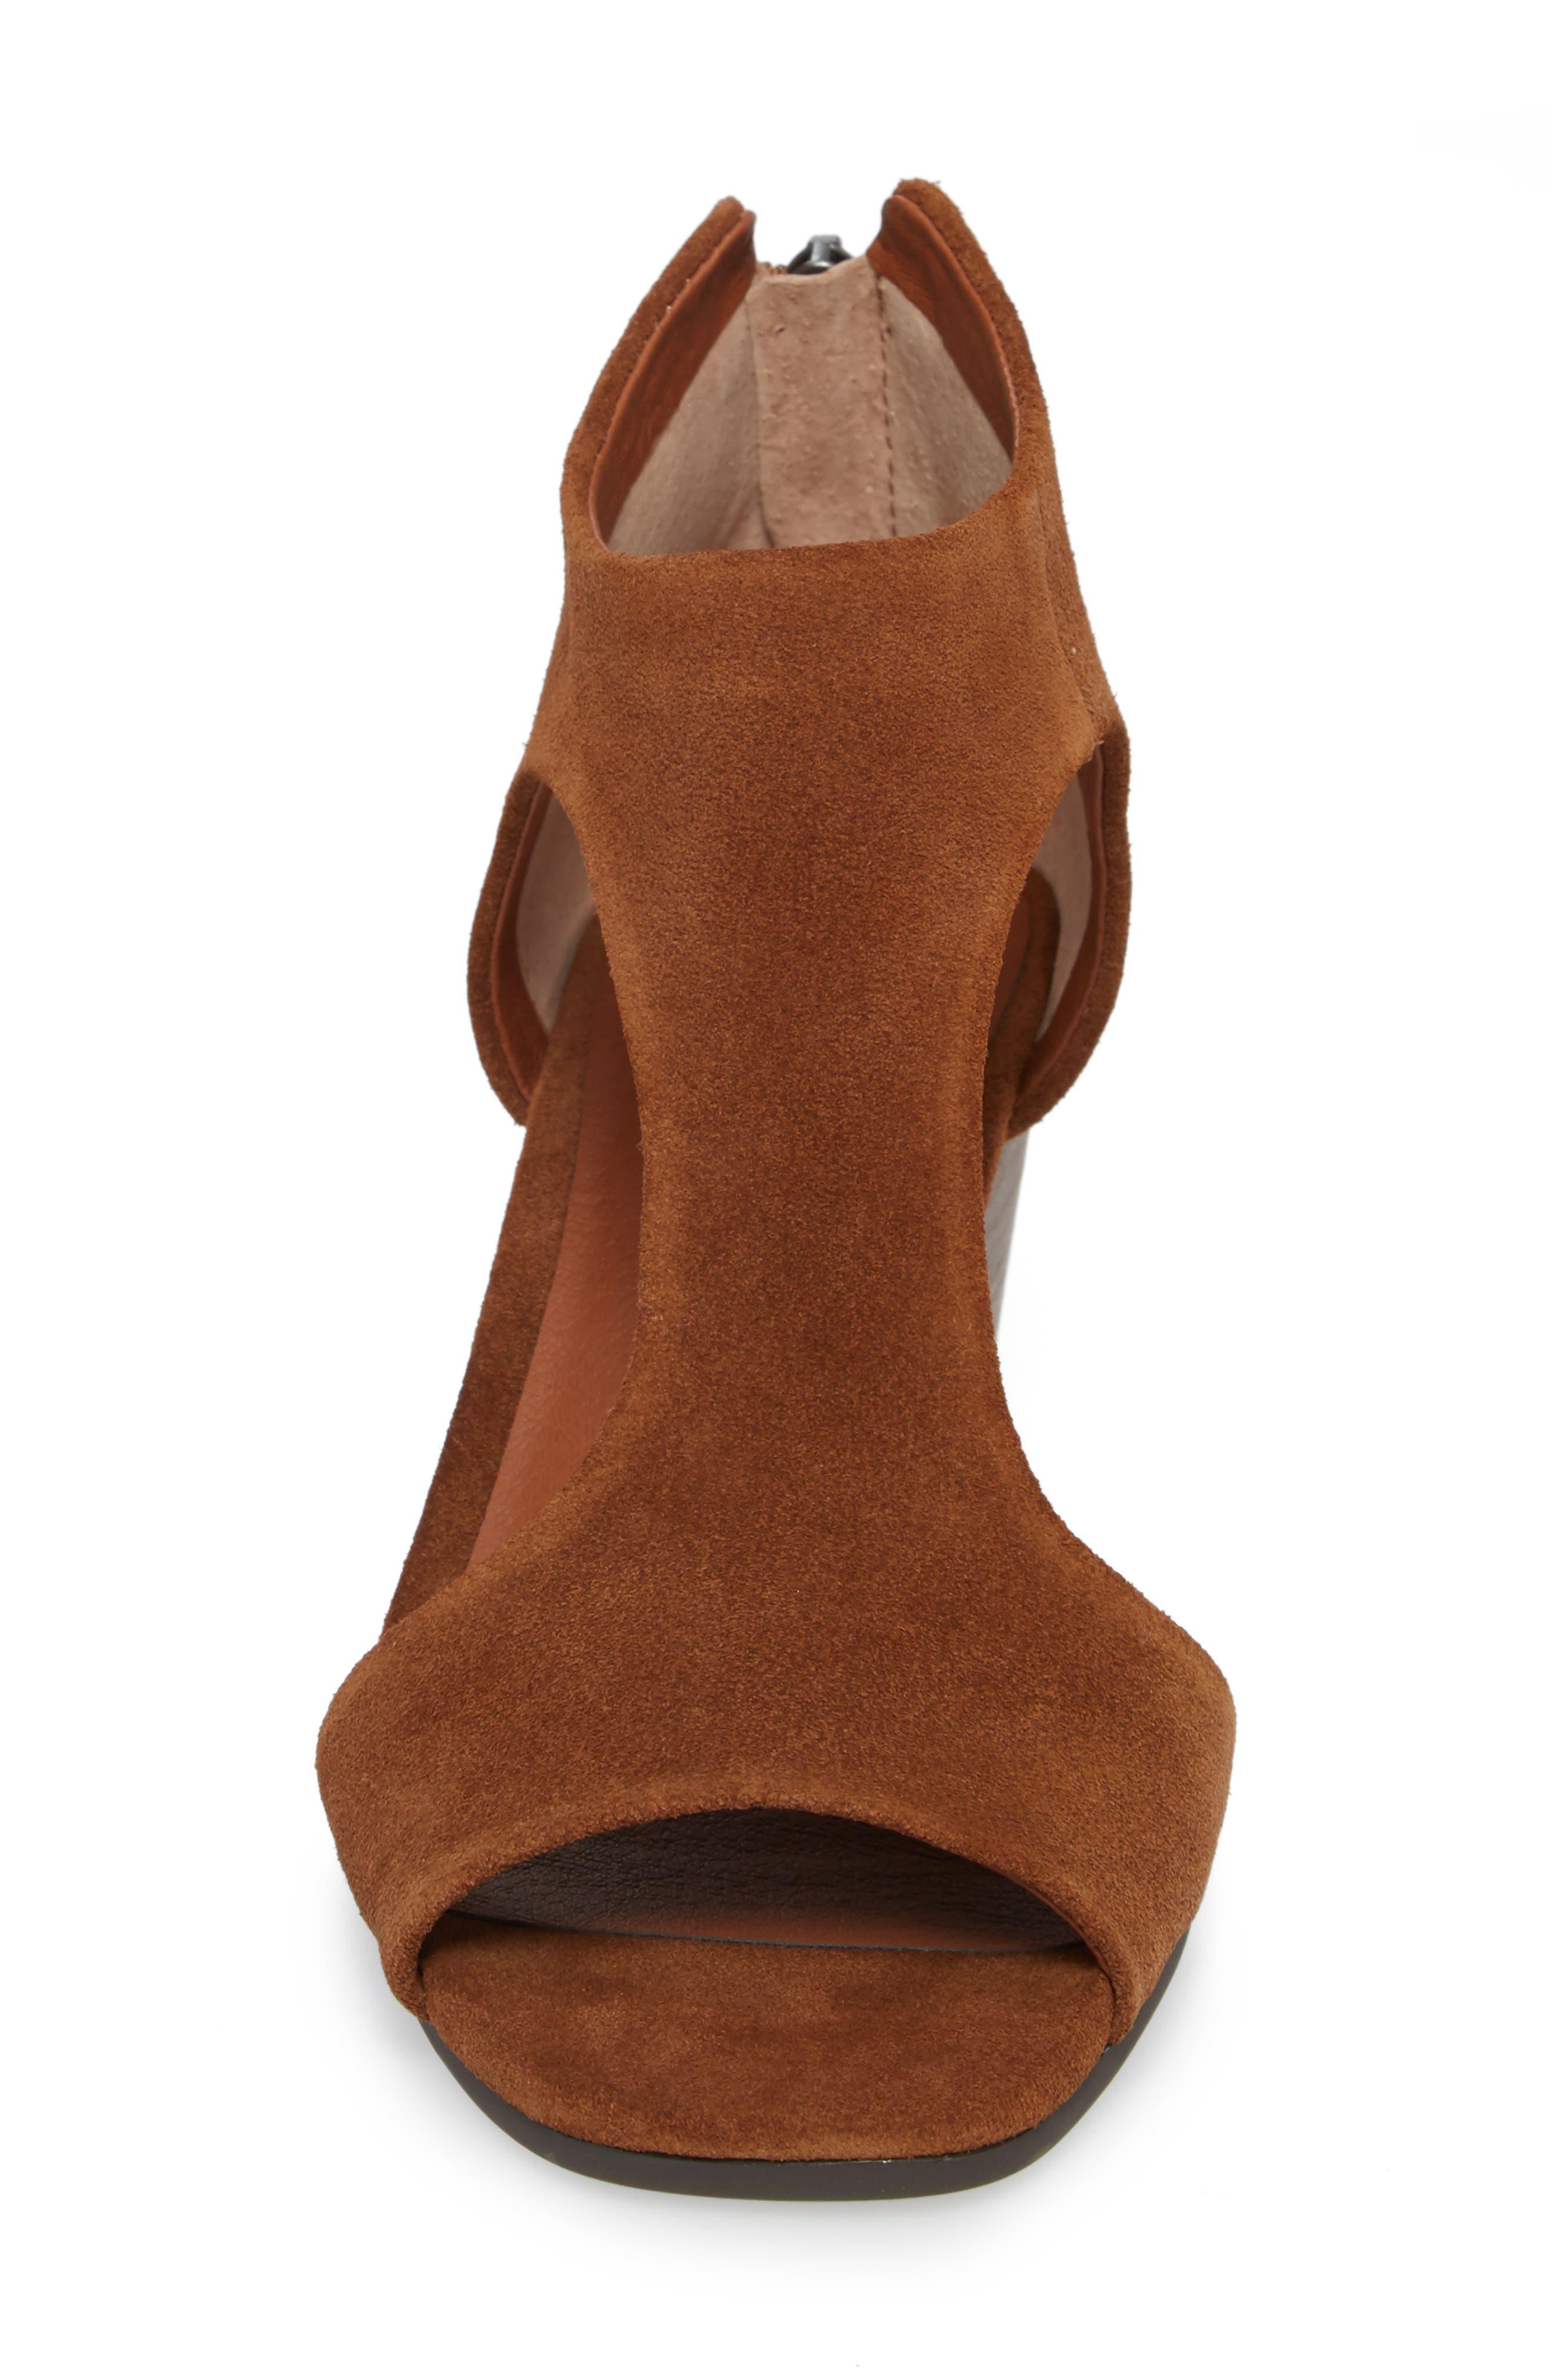 Tehirr Wedge Sandal,                             Alternate thumbnail 4, color,                             Cedar Suede